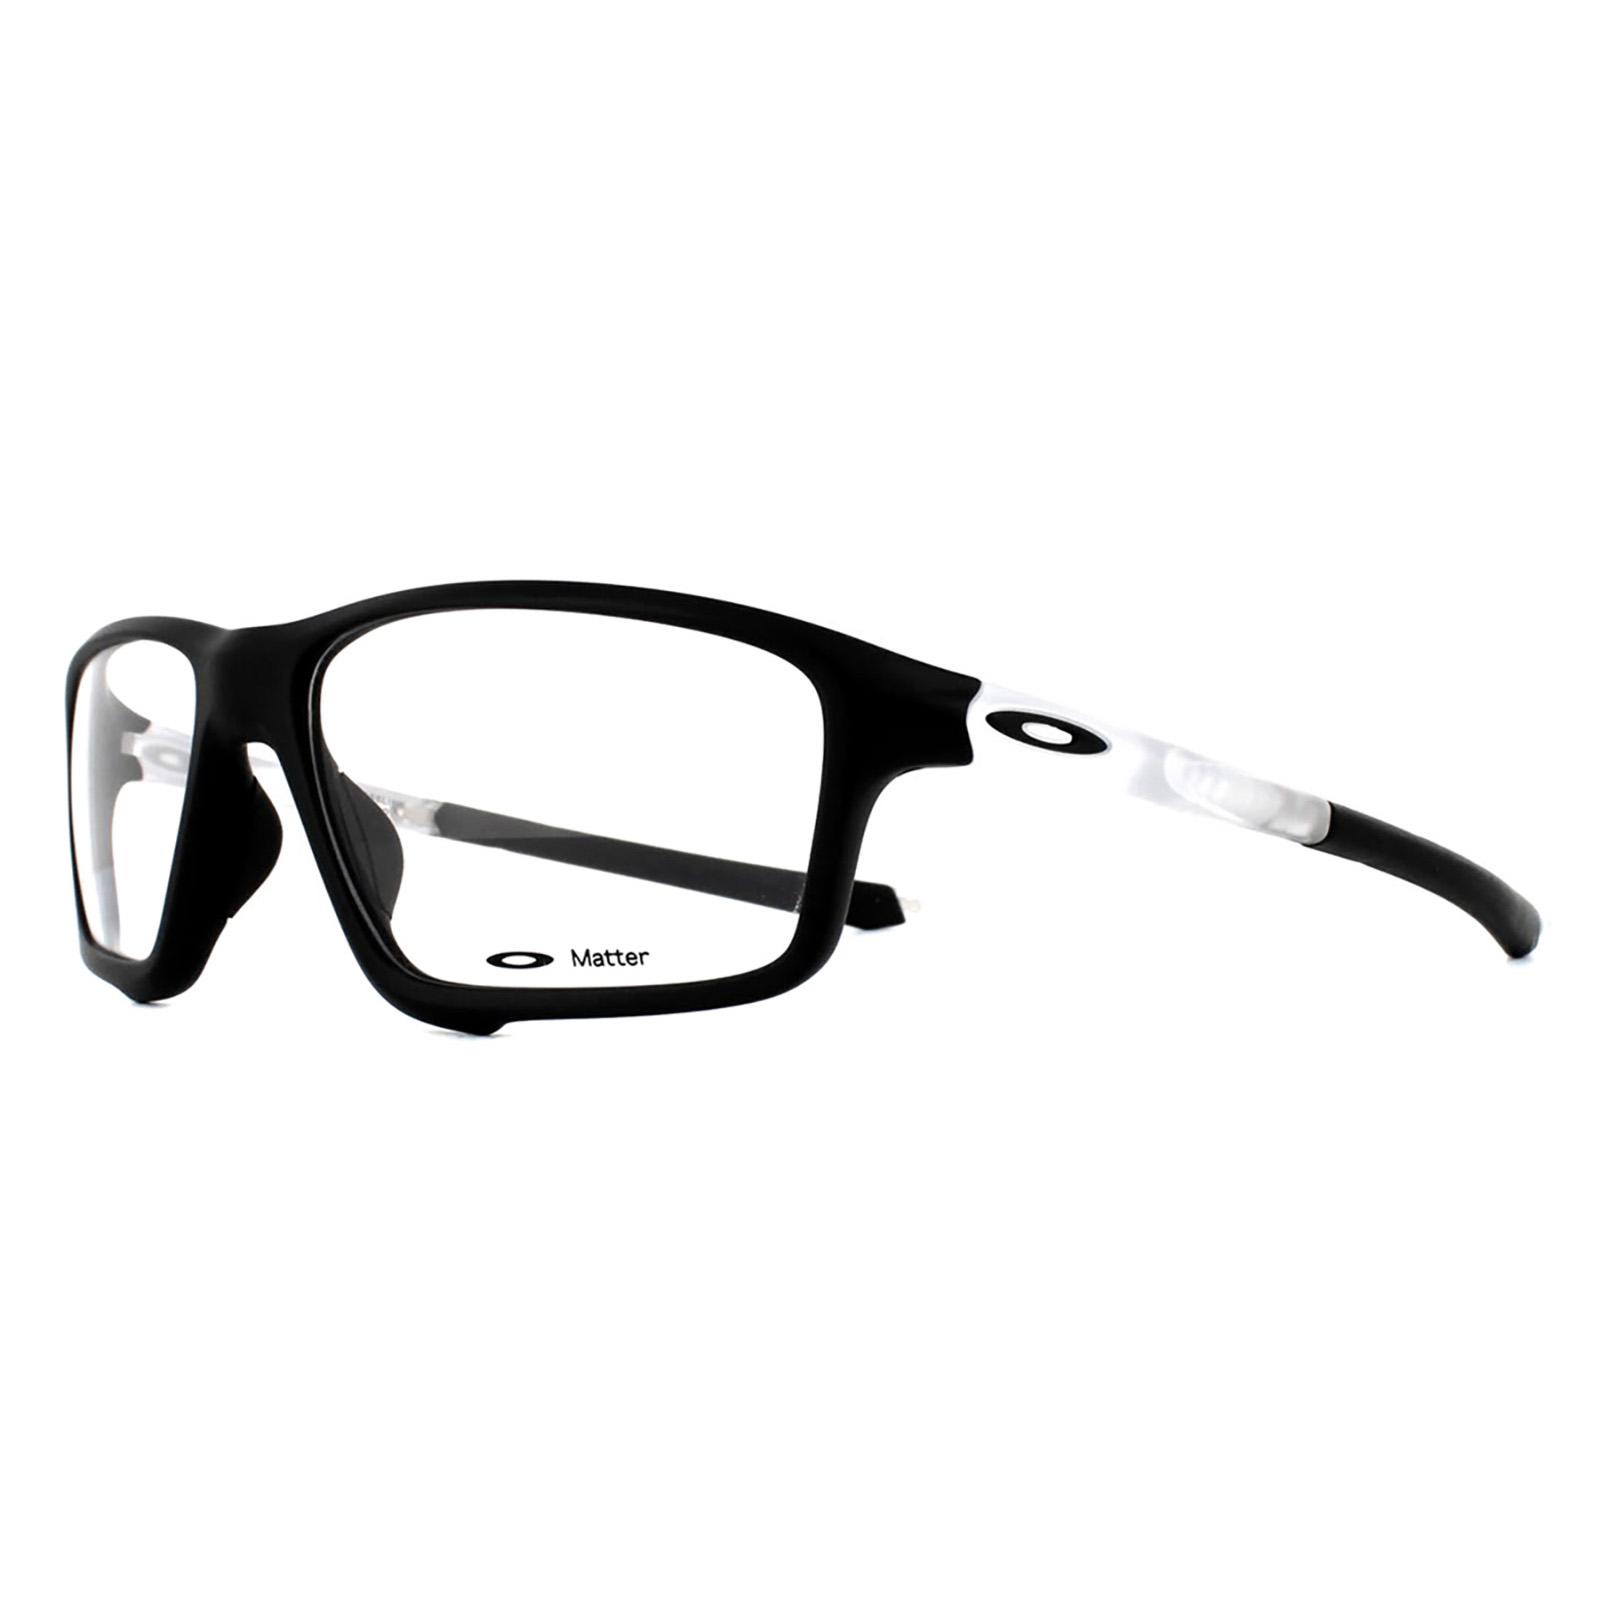 91a9bcf7c3 Oakley Sunglasses For Men Small Frame Cat Eye « Heritage Malta